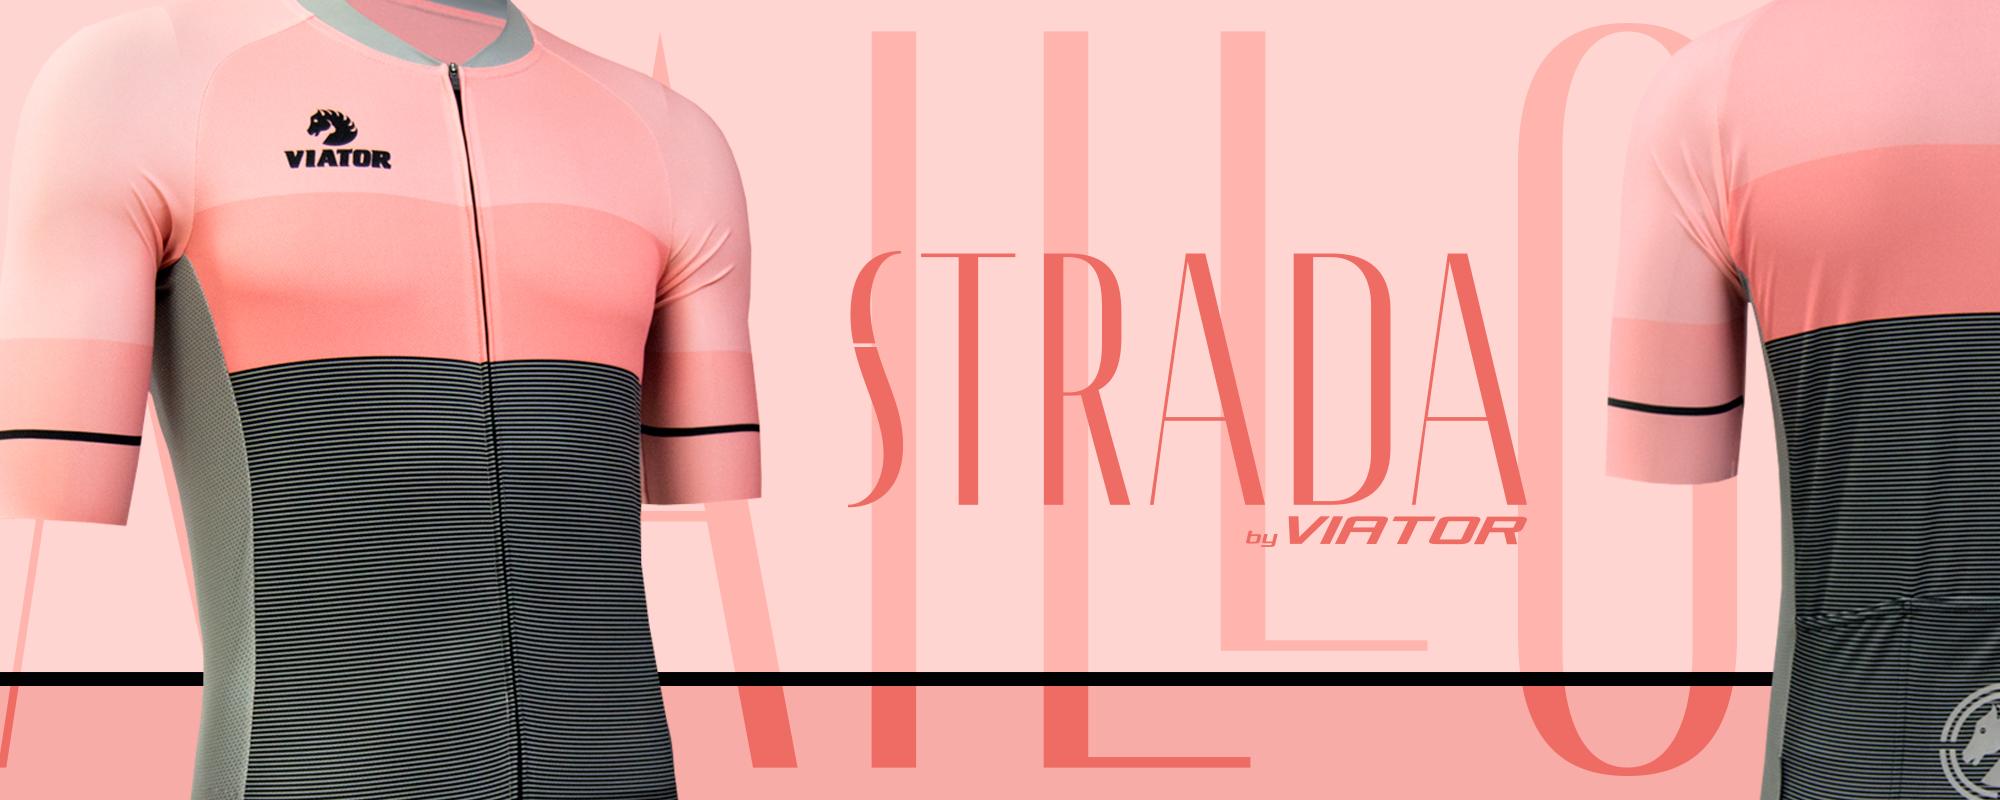 sliderSTRADA18